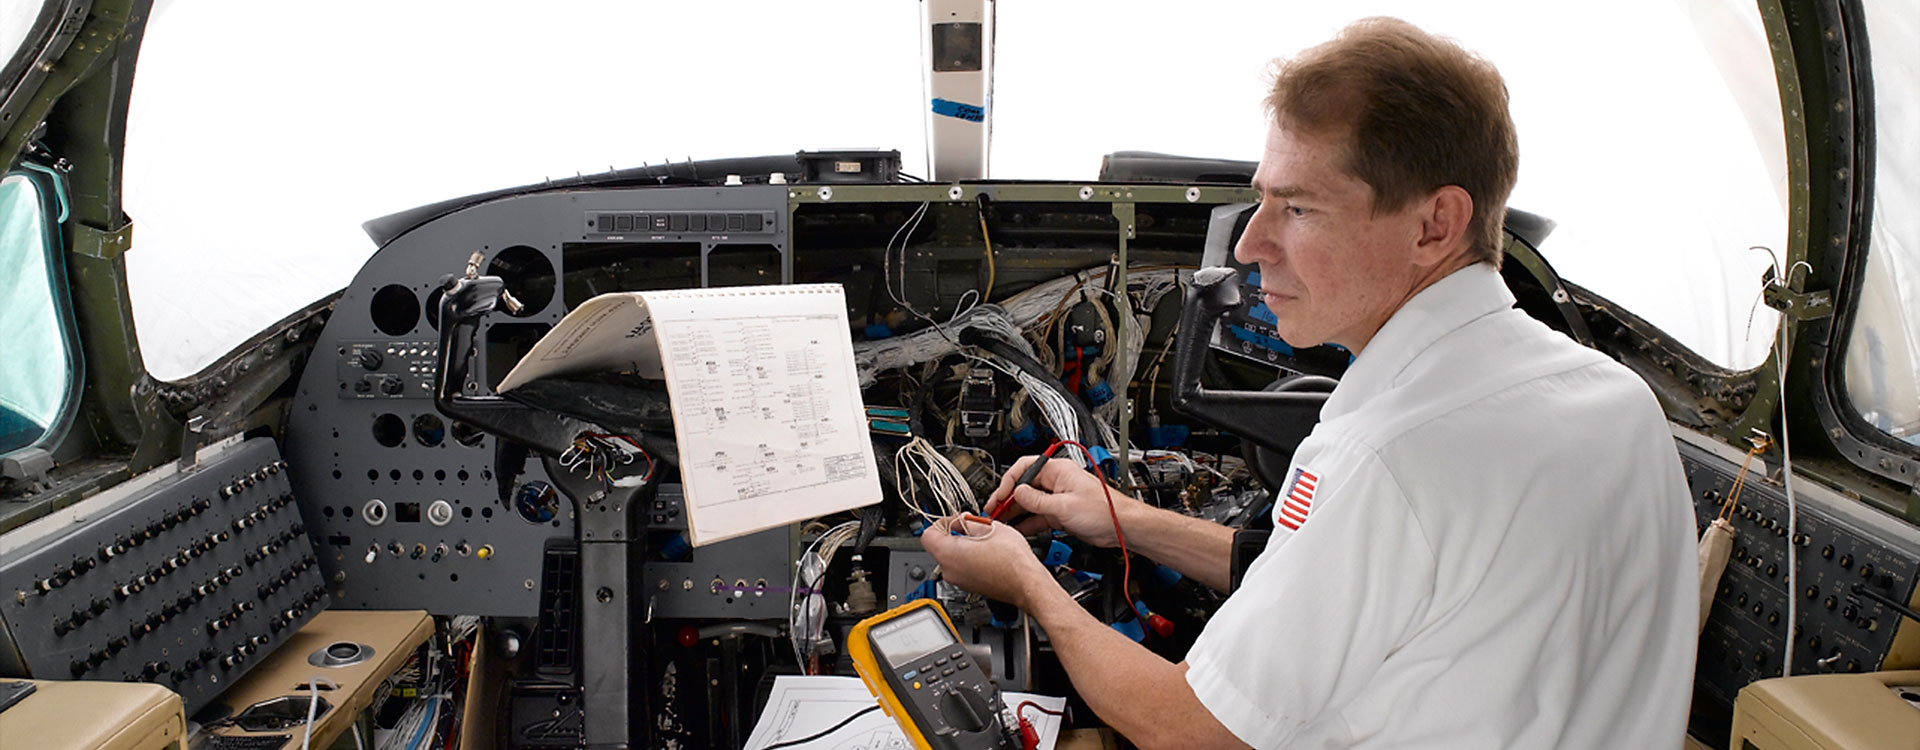 Technician installing avionics corporate jet